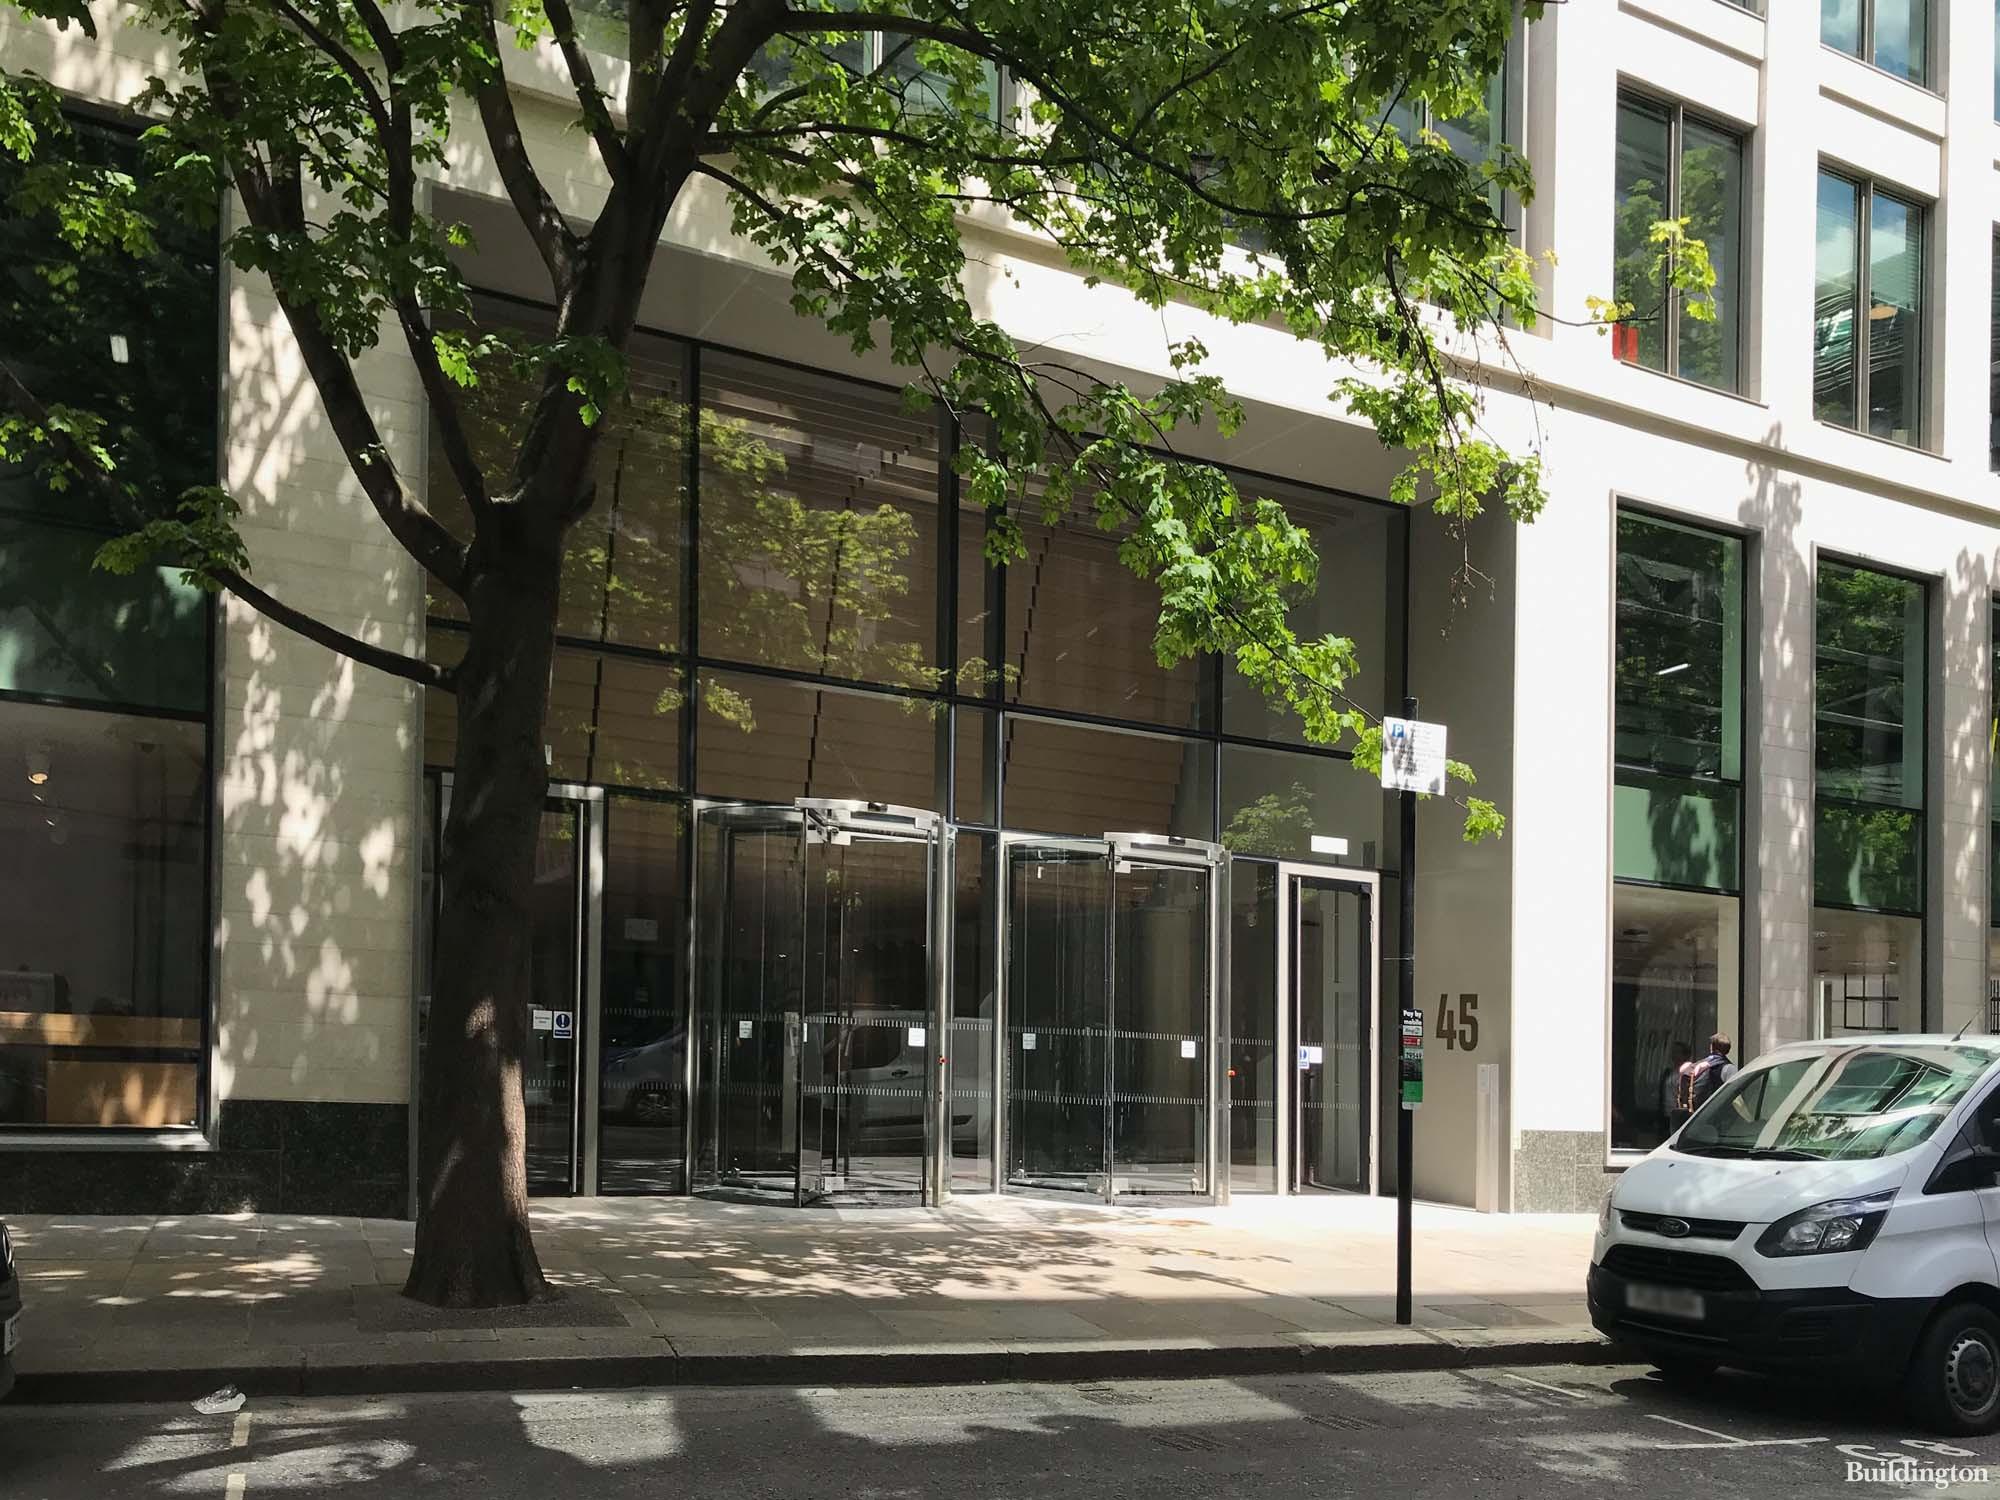 The main entrance to Gresham St Paul's at 45 Gresham Street in the City of London EC2.